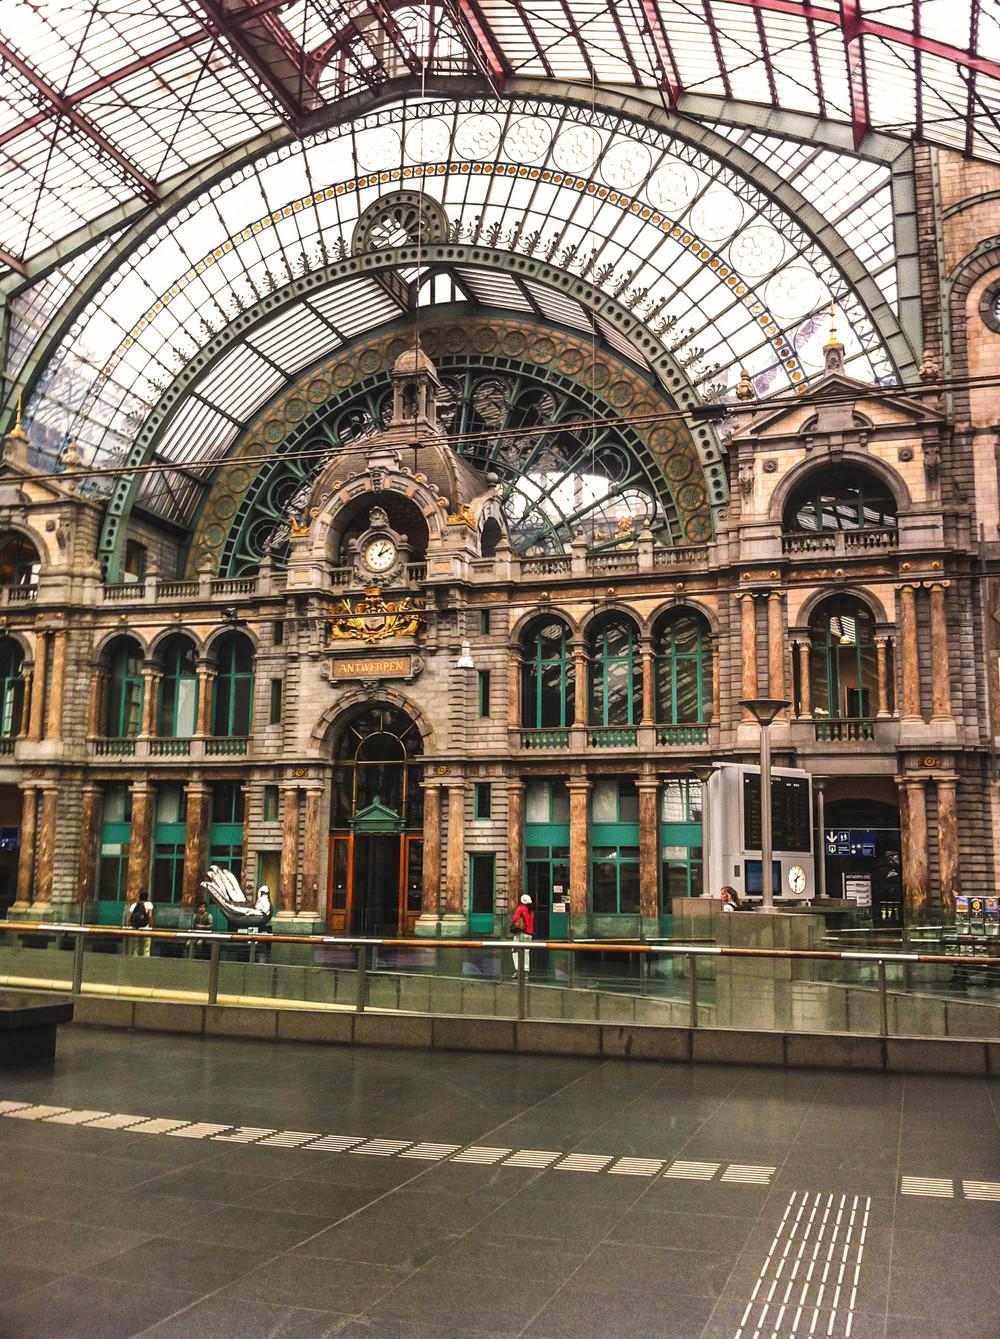 Antwerp train station by Nneya Richards